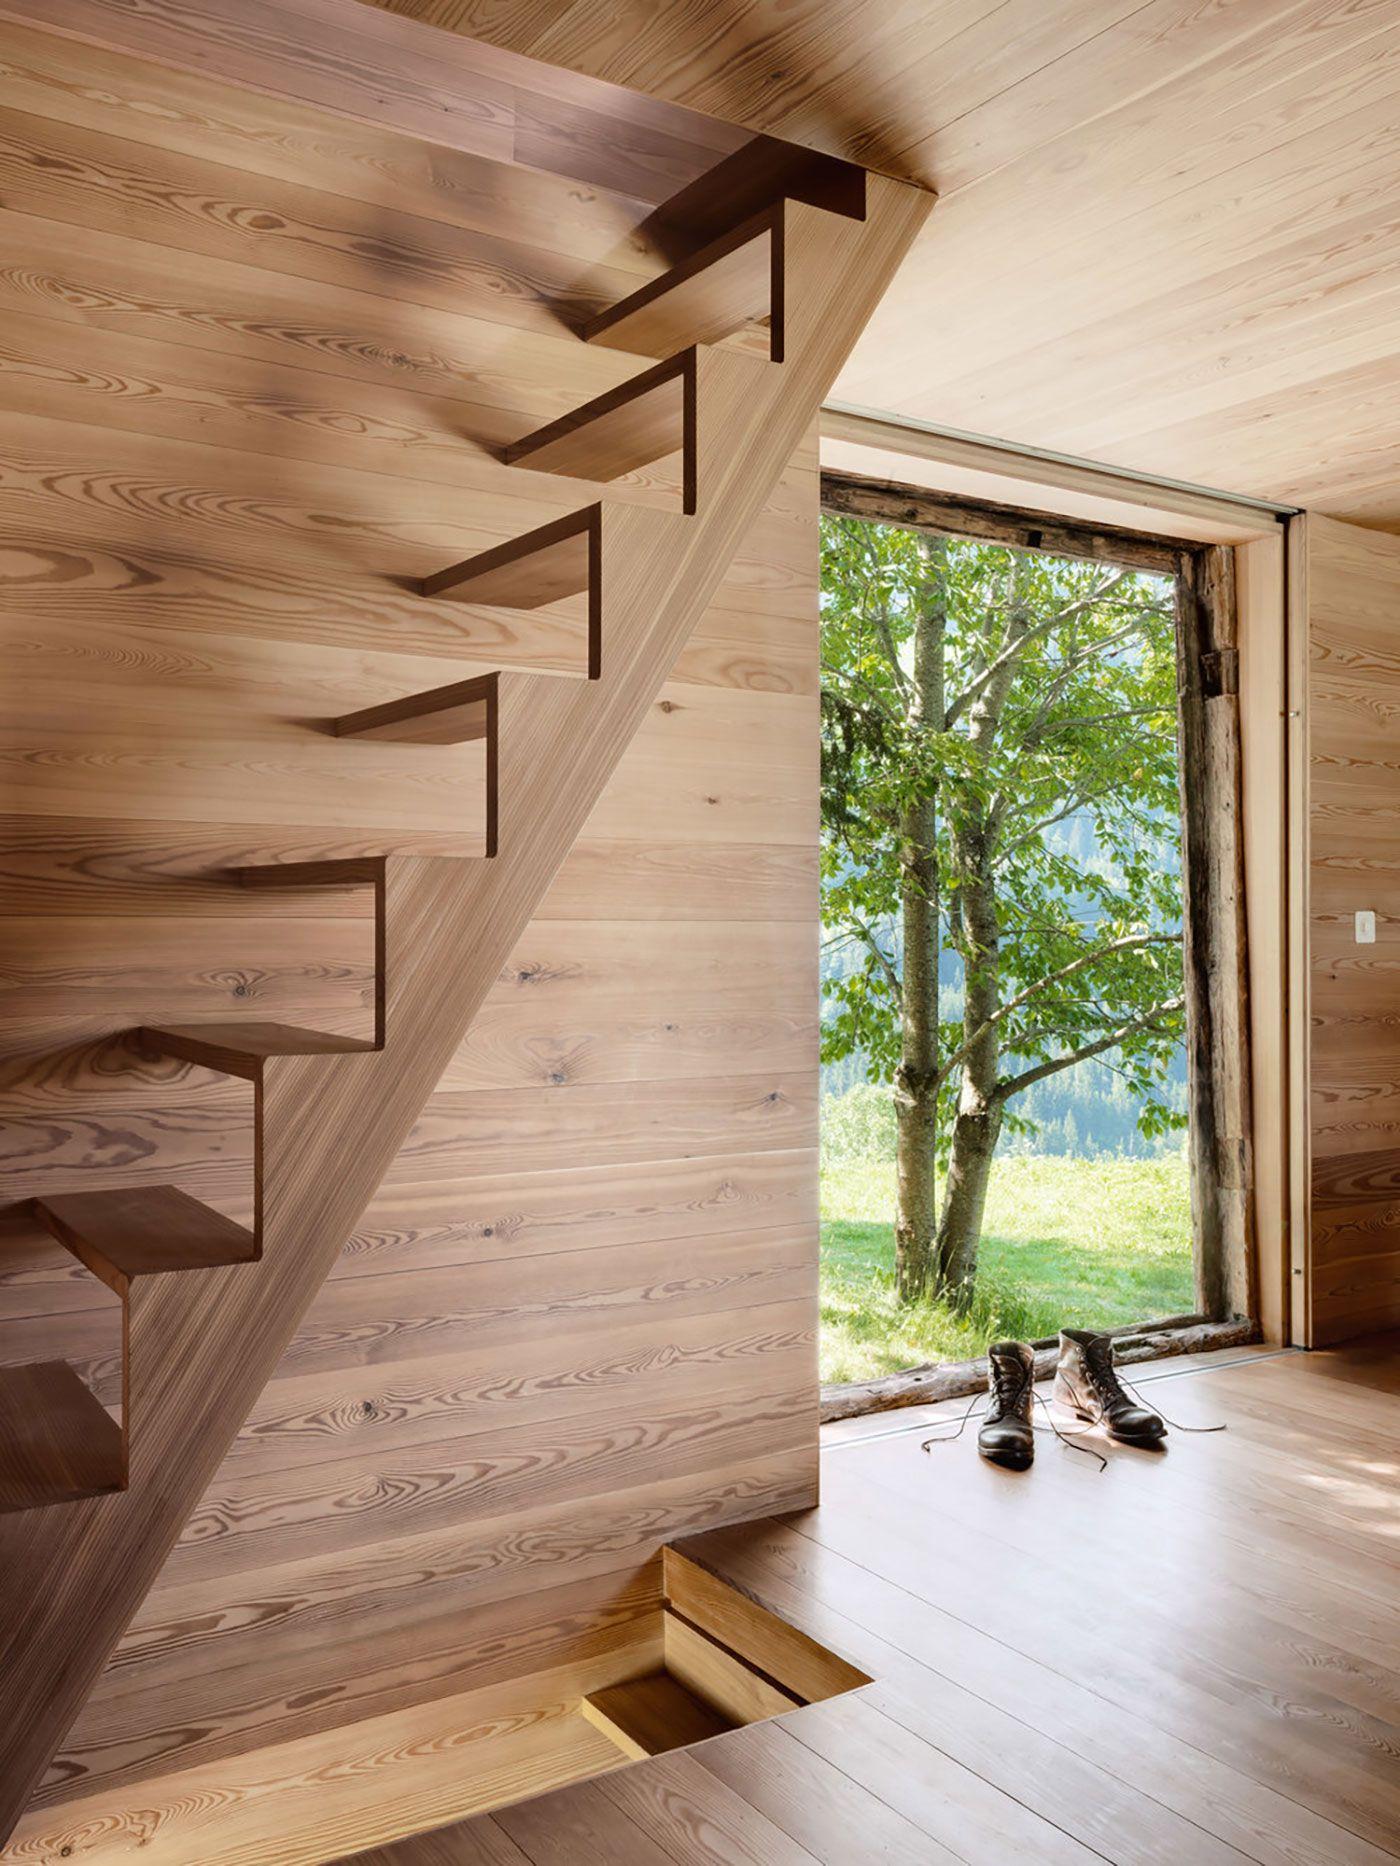 The quaint and cozy Sarreyer cabin designed